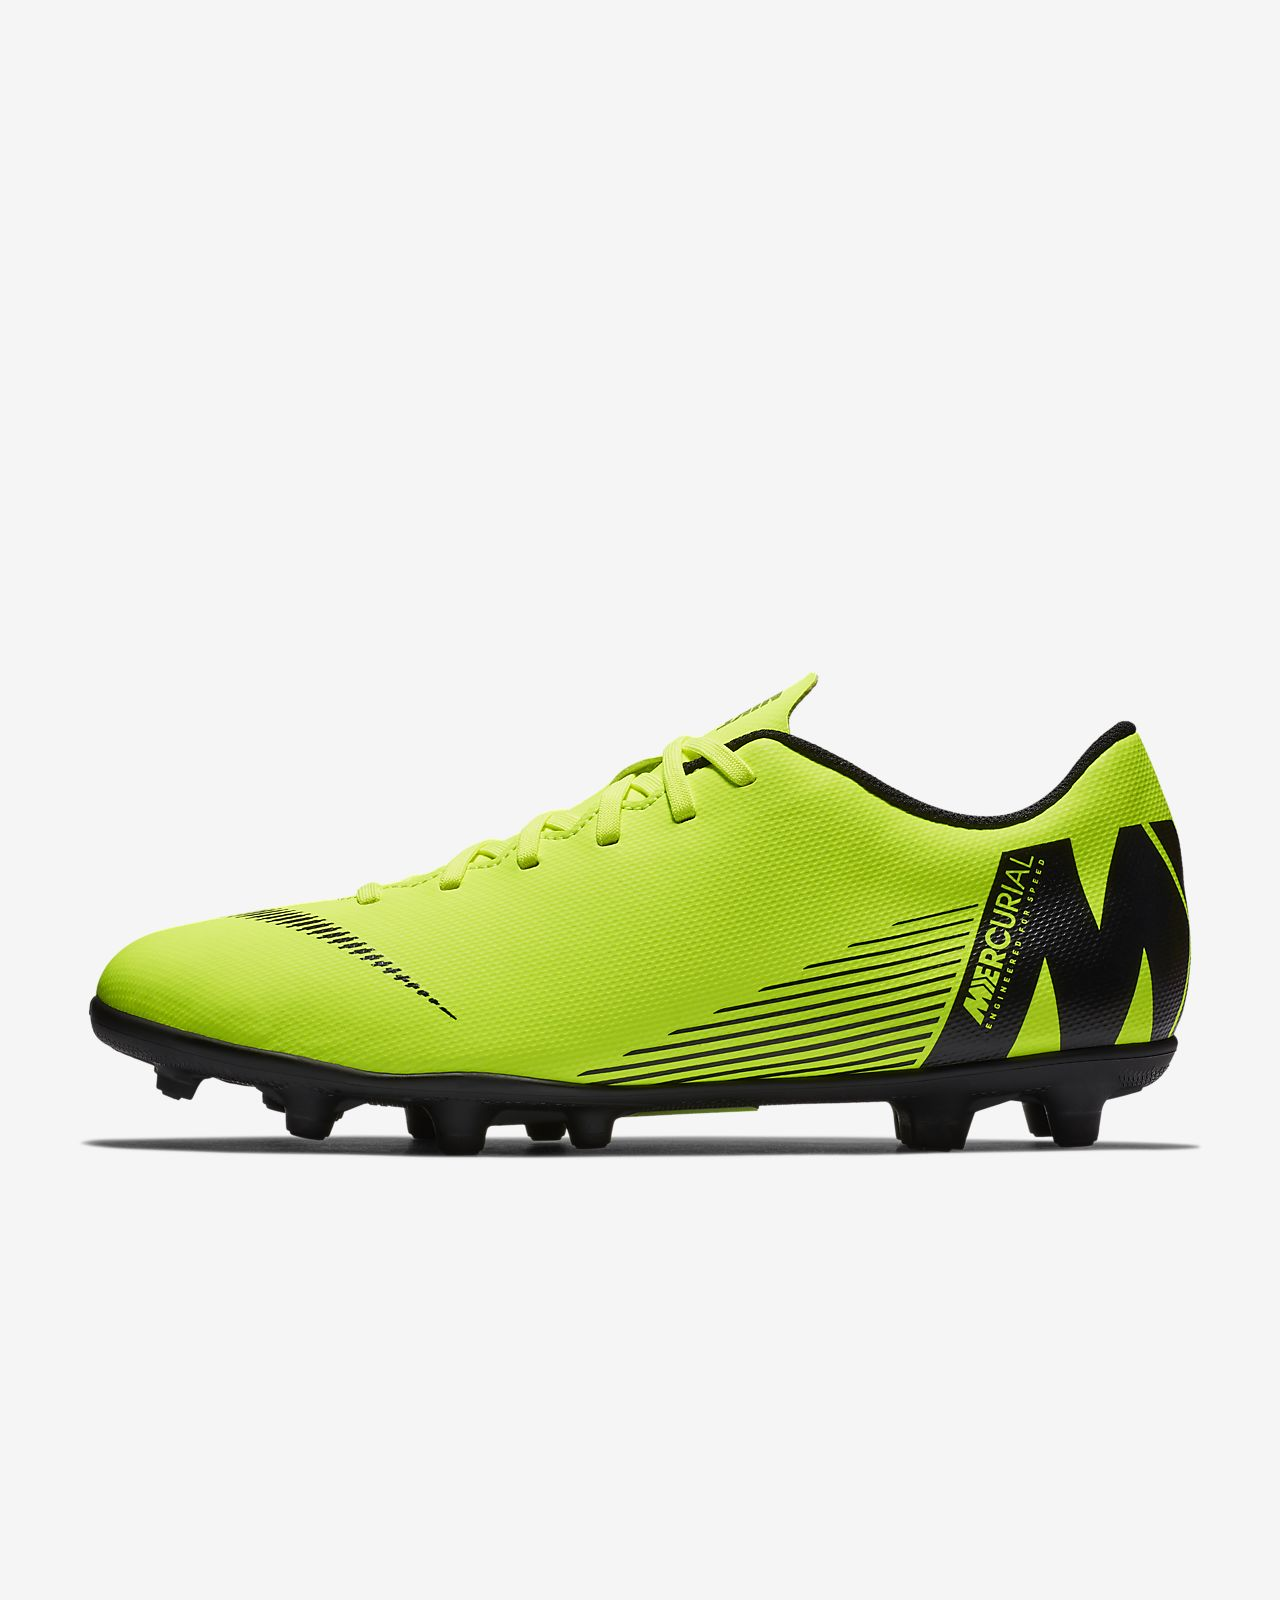 Da Calcio It Scarpa Xii Nike Multiterreno Vapor Mercurial Club dqv5w